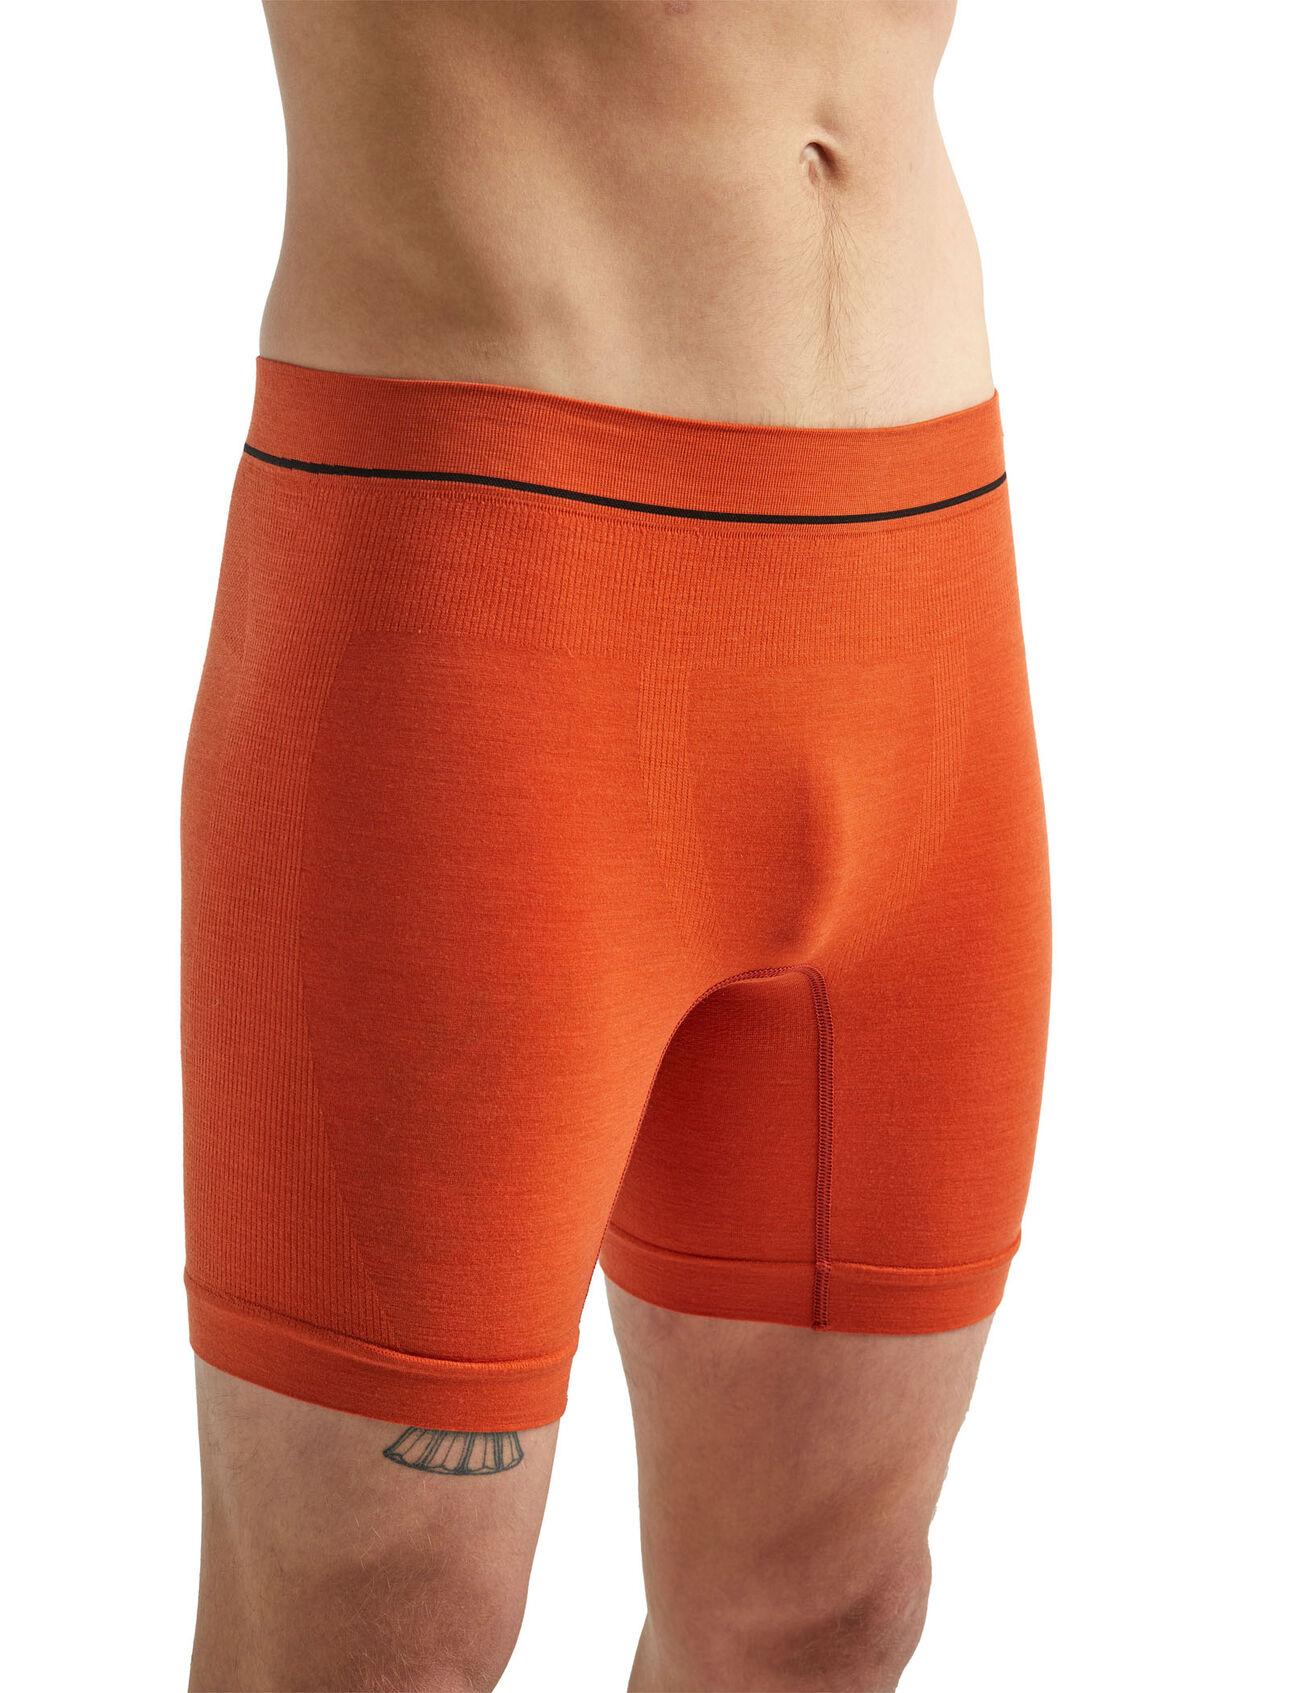 Cool-Lite™ Merino Anatomica Seamless Long Boxers